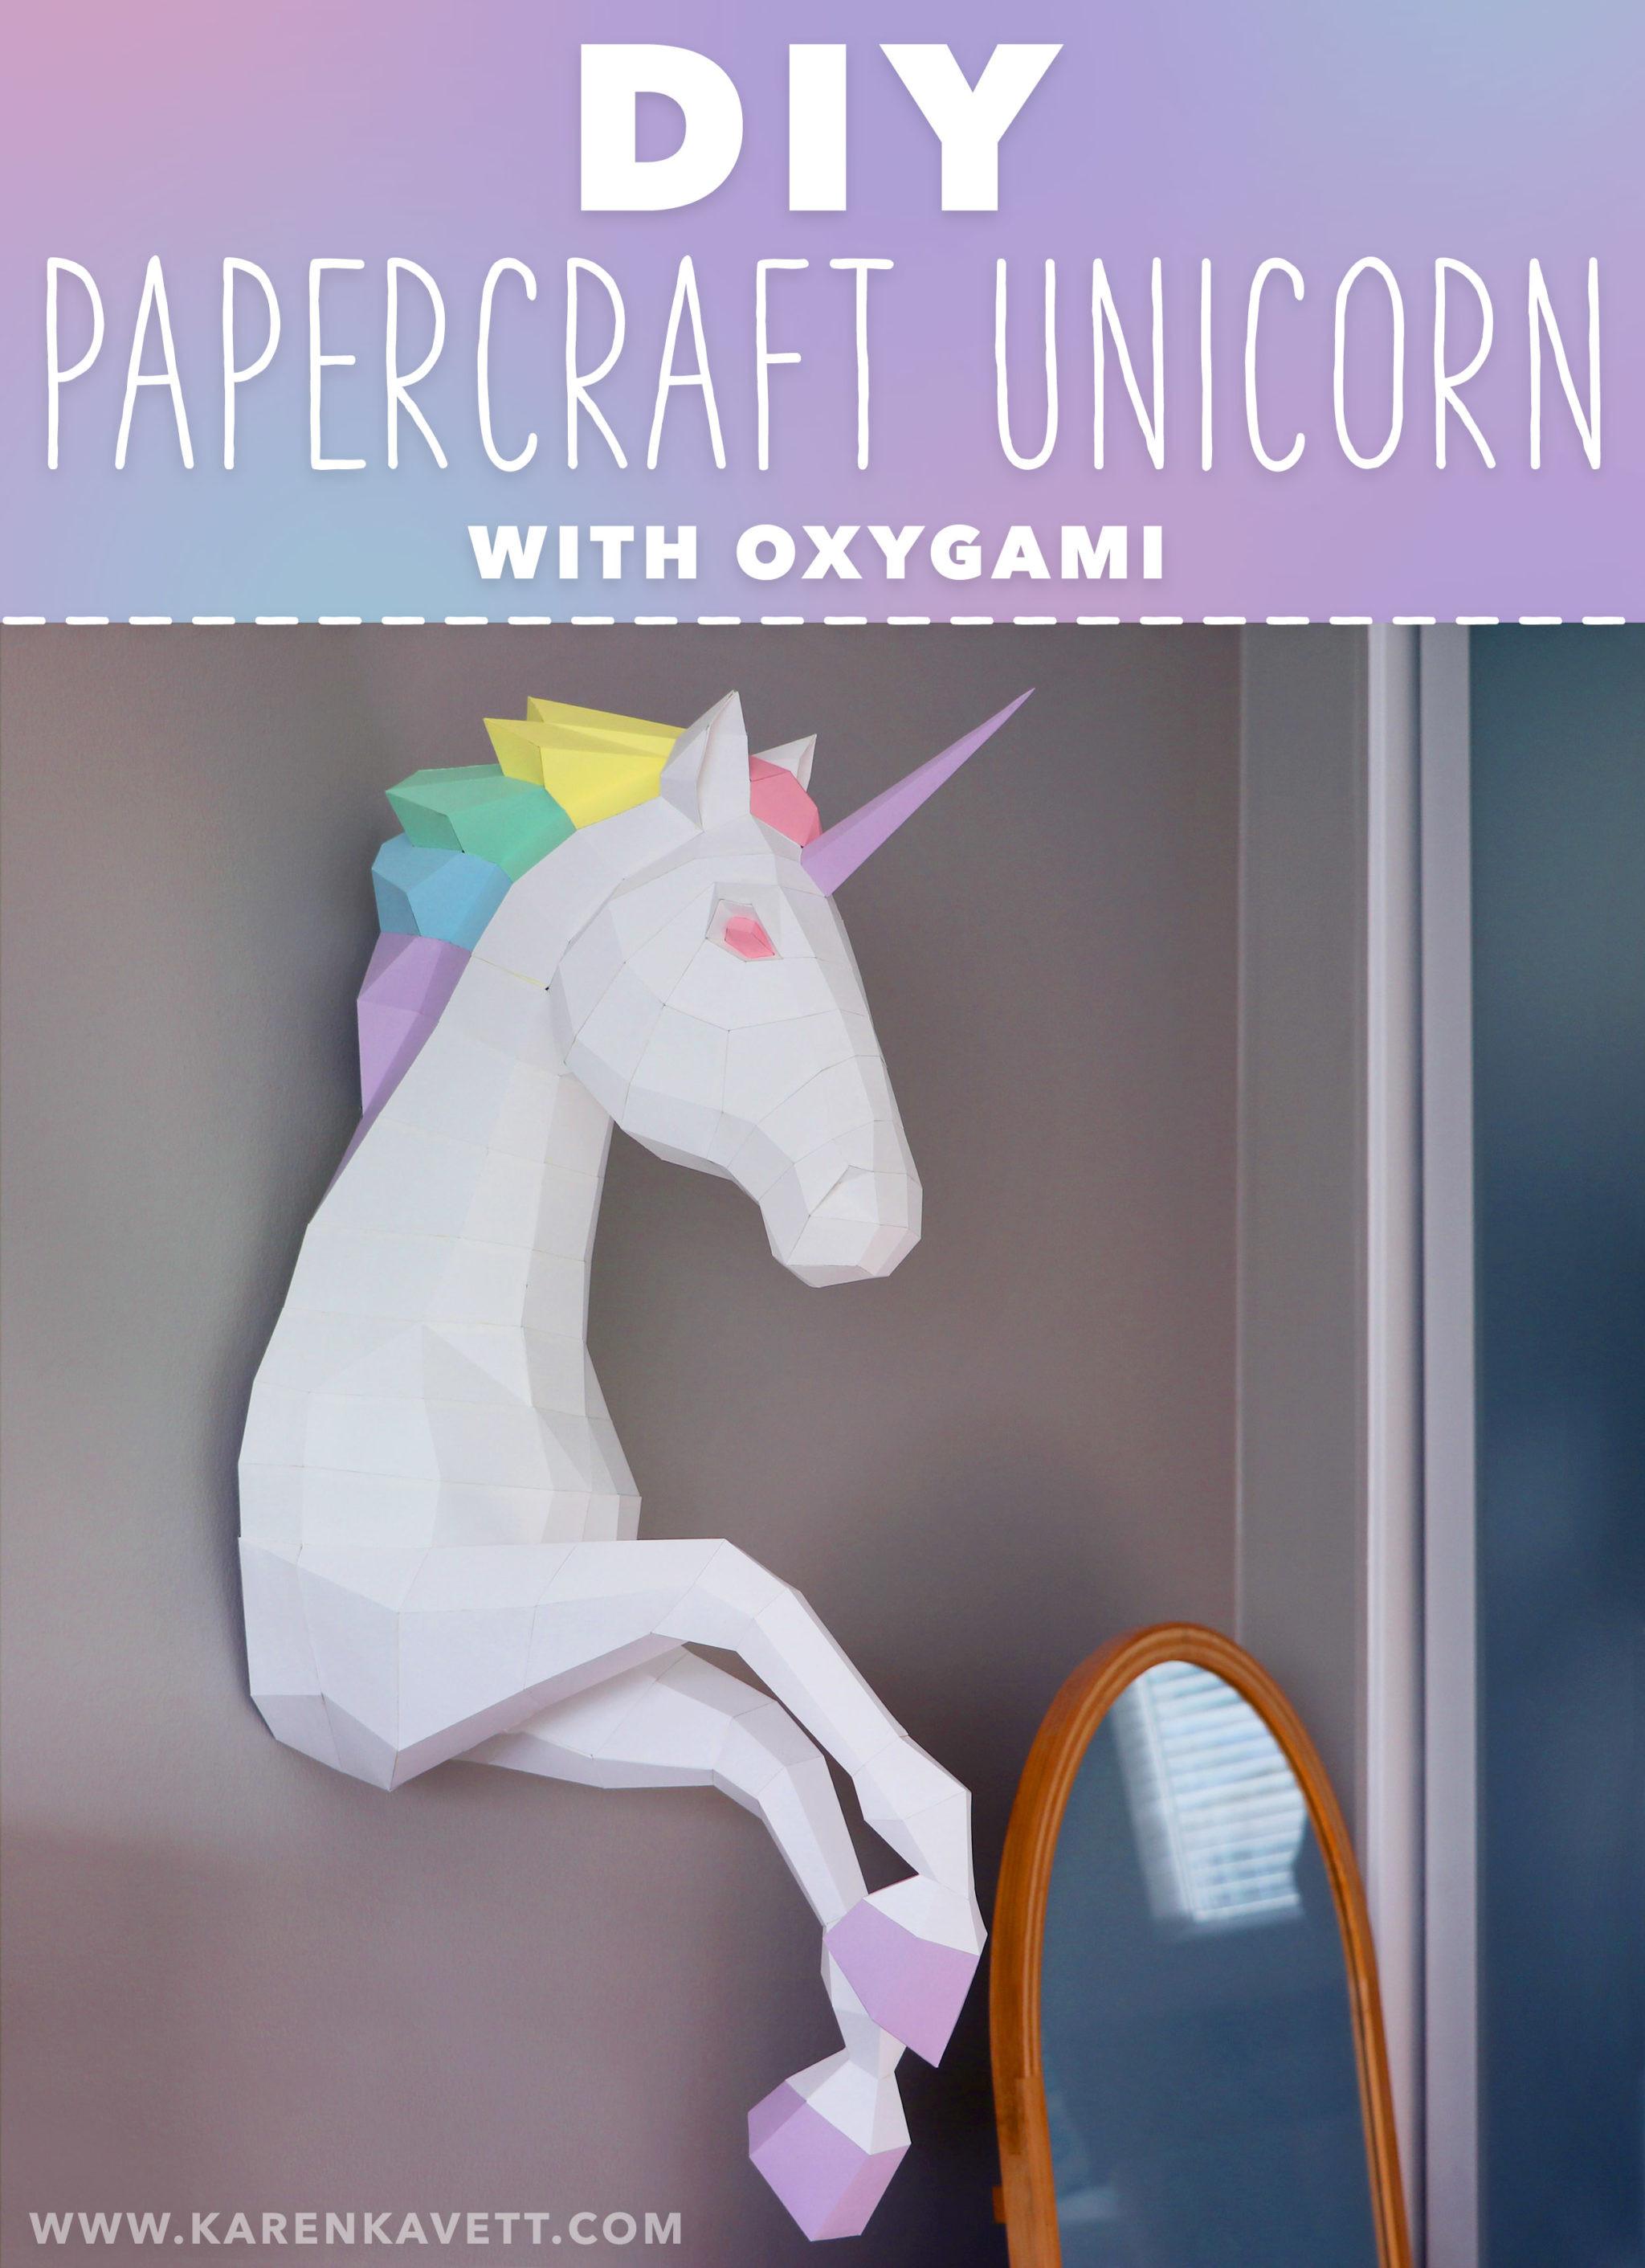 Unicorn Diy  DIY Papercraft Unicorn with Oxygami Karen Kavett